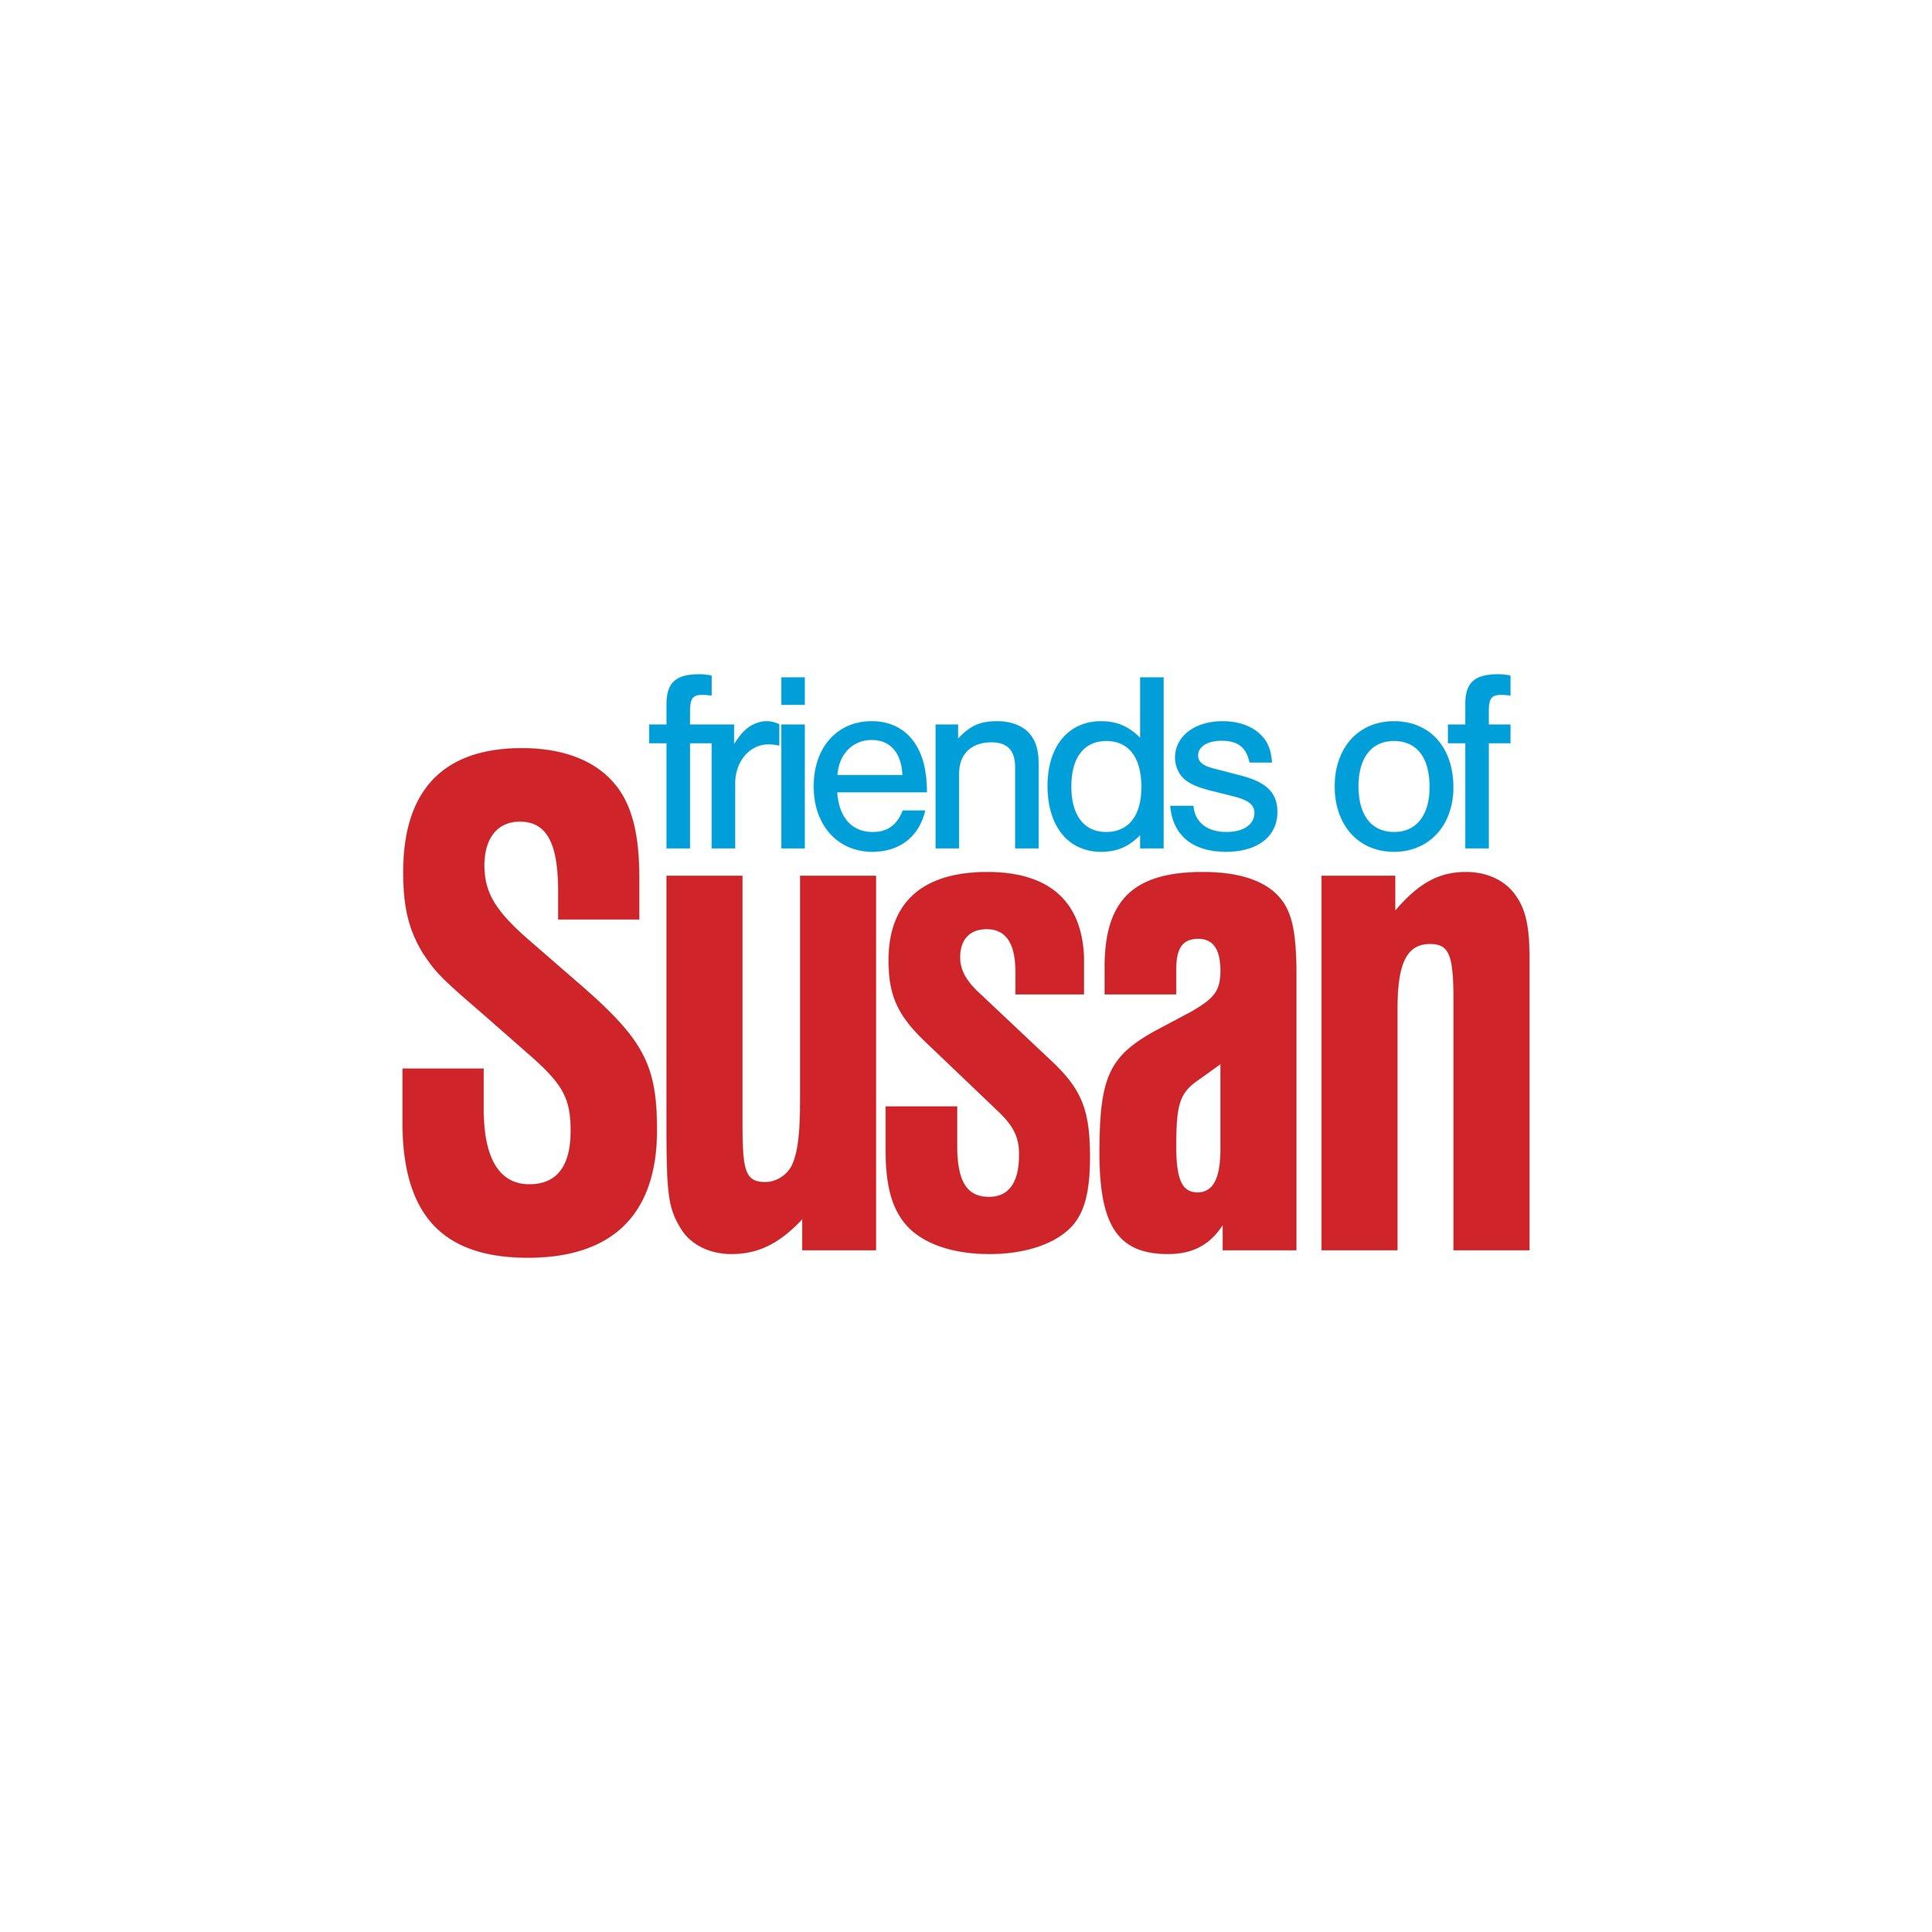 Friends of Susan